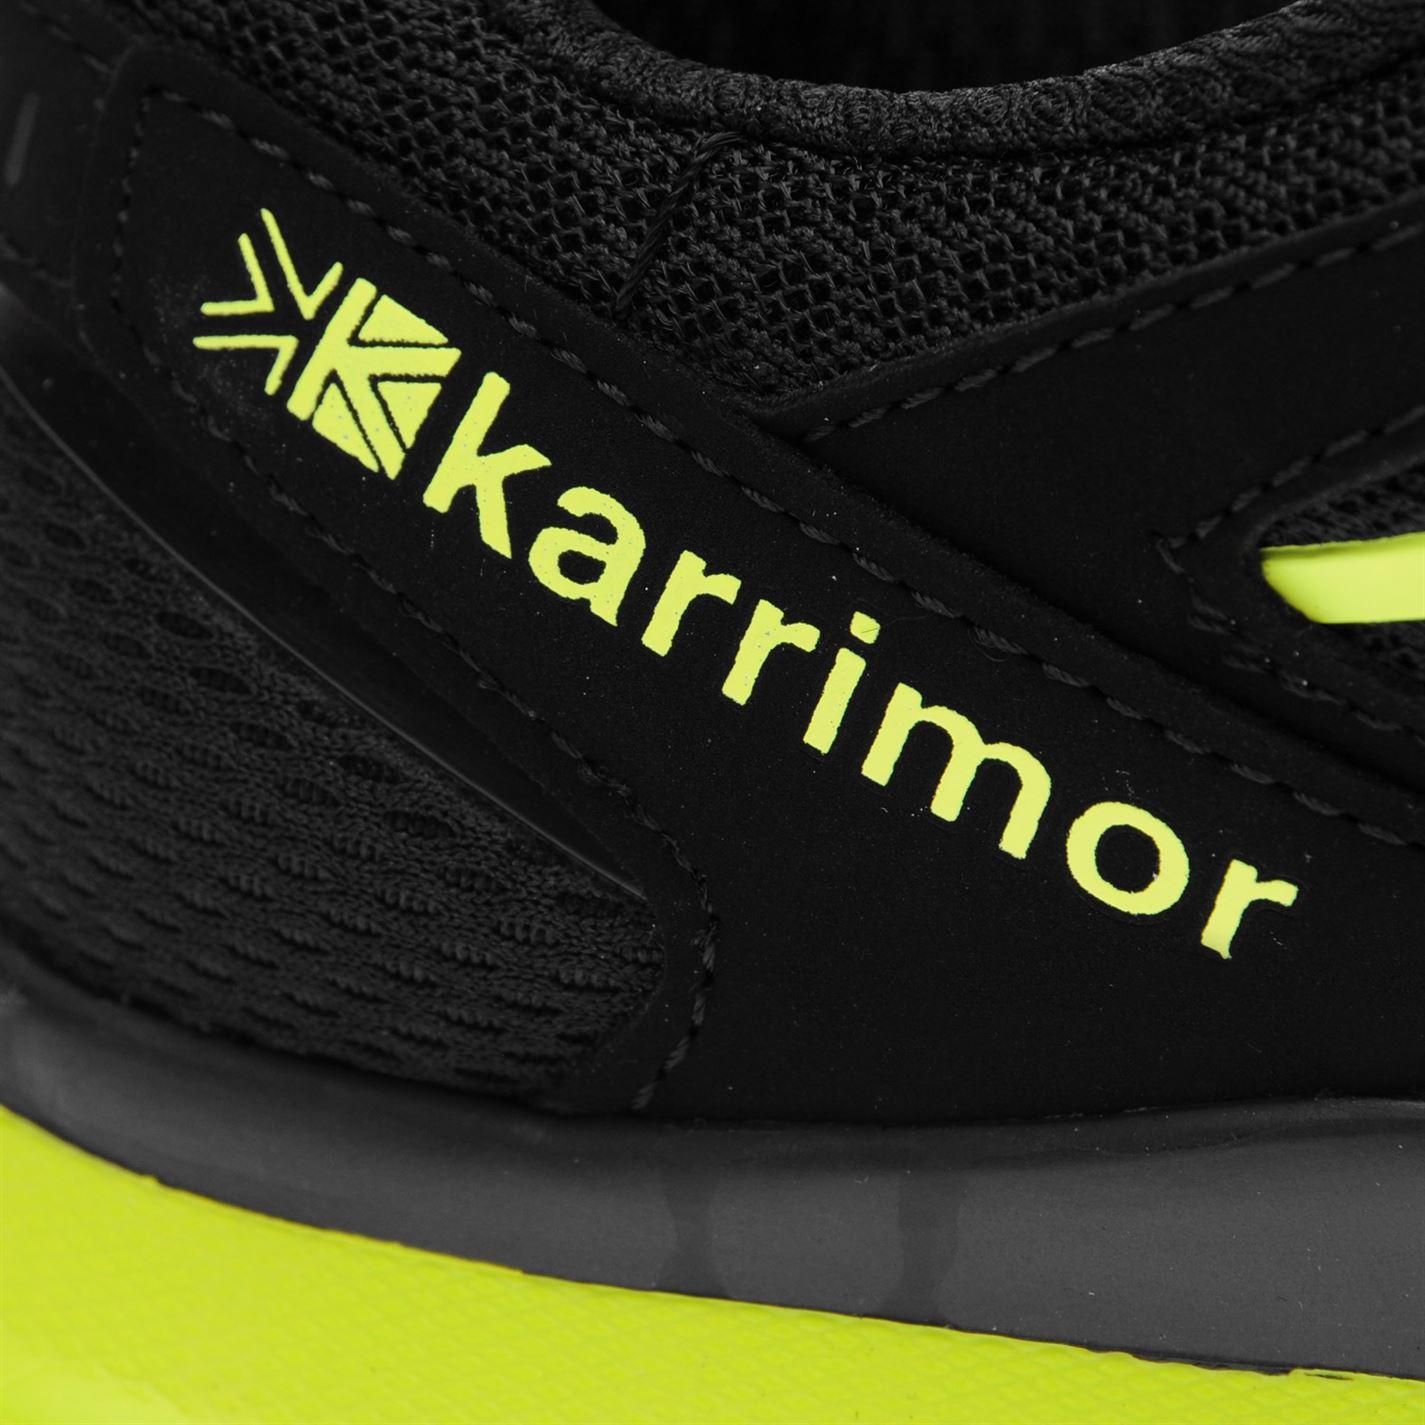 Karrimor-Mens-Duma-Trainers-Lace-Up-Sports-Running-Cross-Training-Shoes thumbnail 32